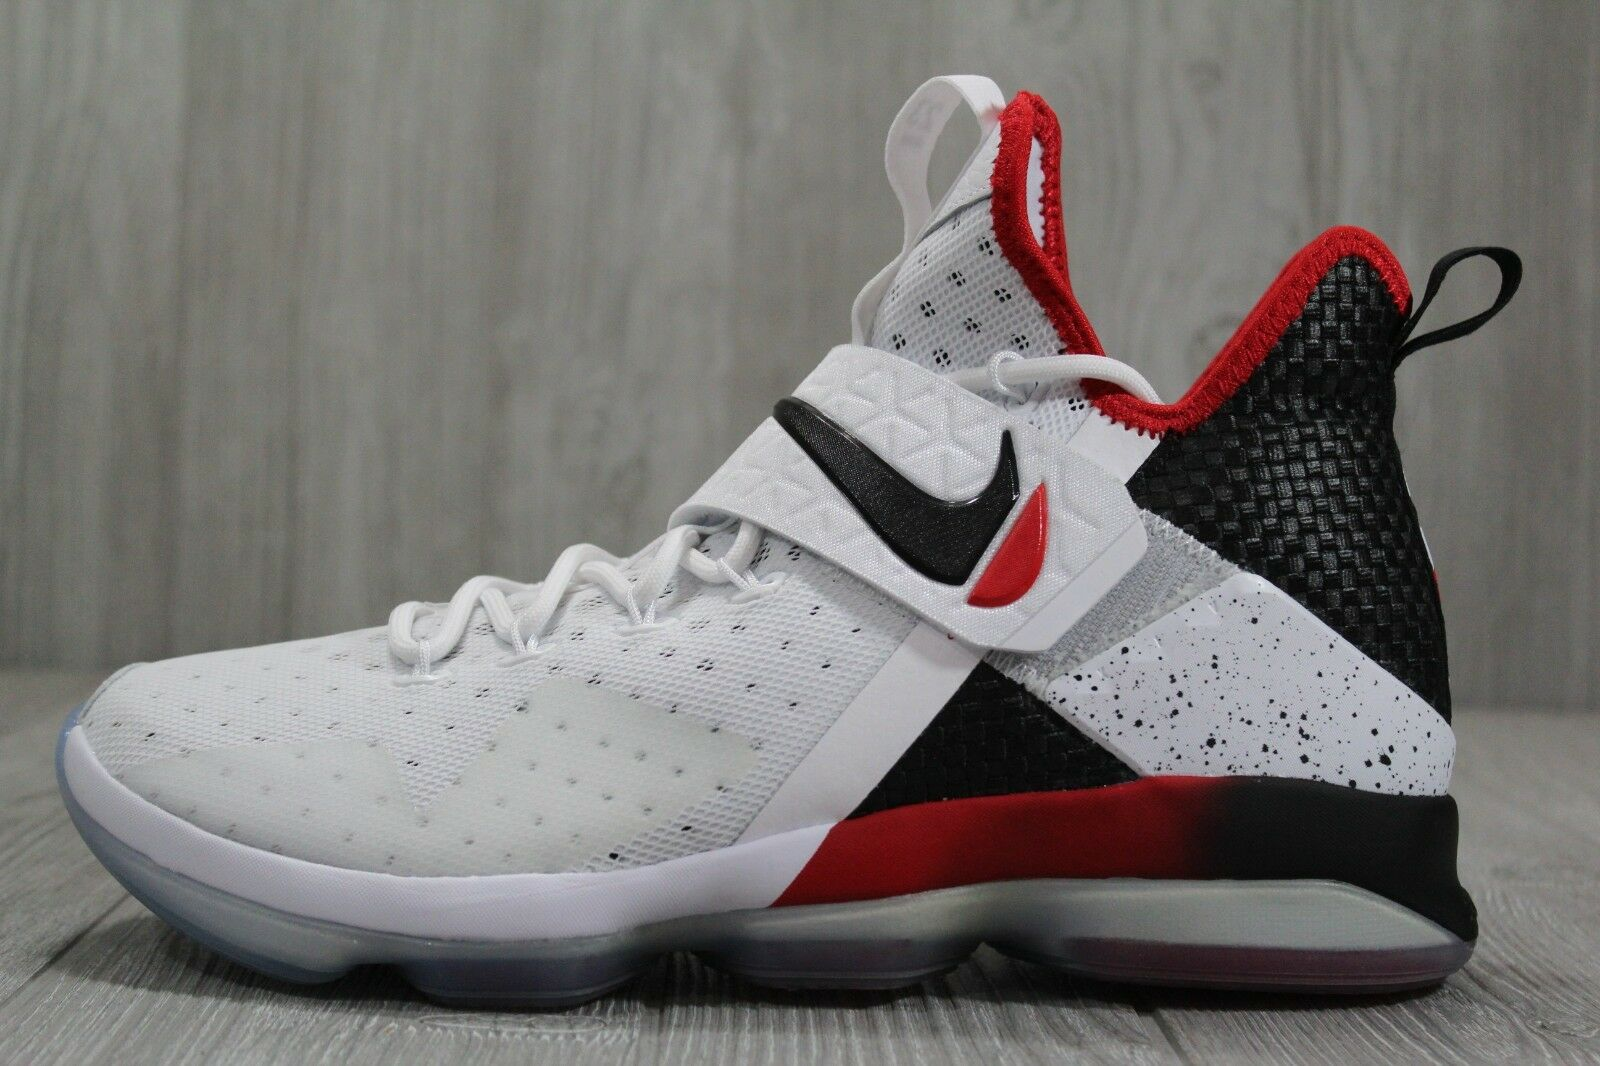 35 Nike Lebron XIV 14 Flip The Switch White Black shoes 10.5 11 16 852405-103